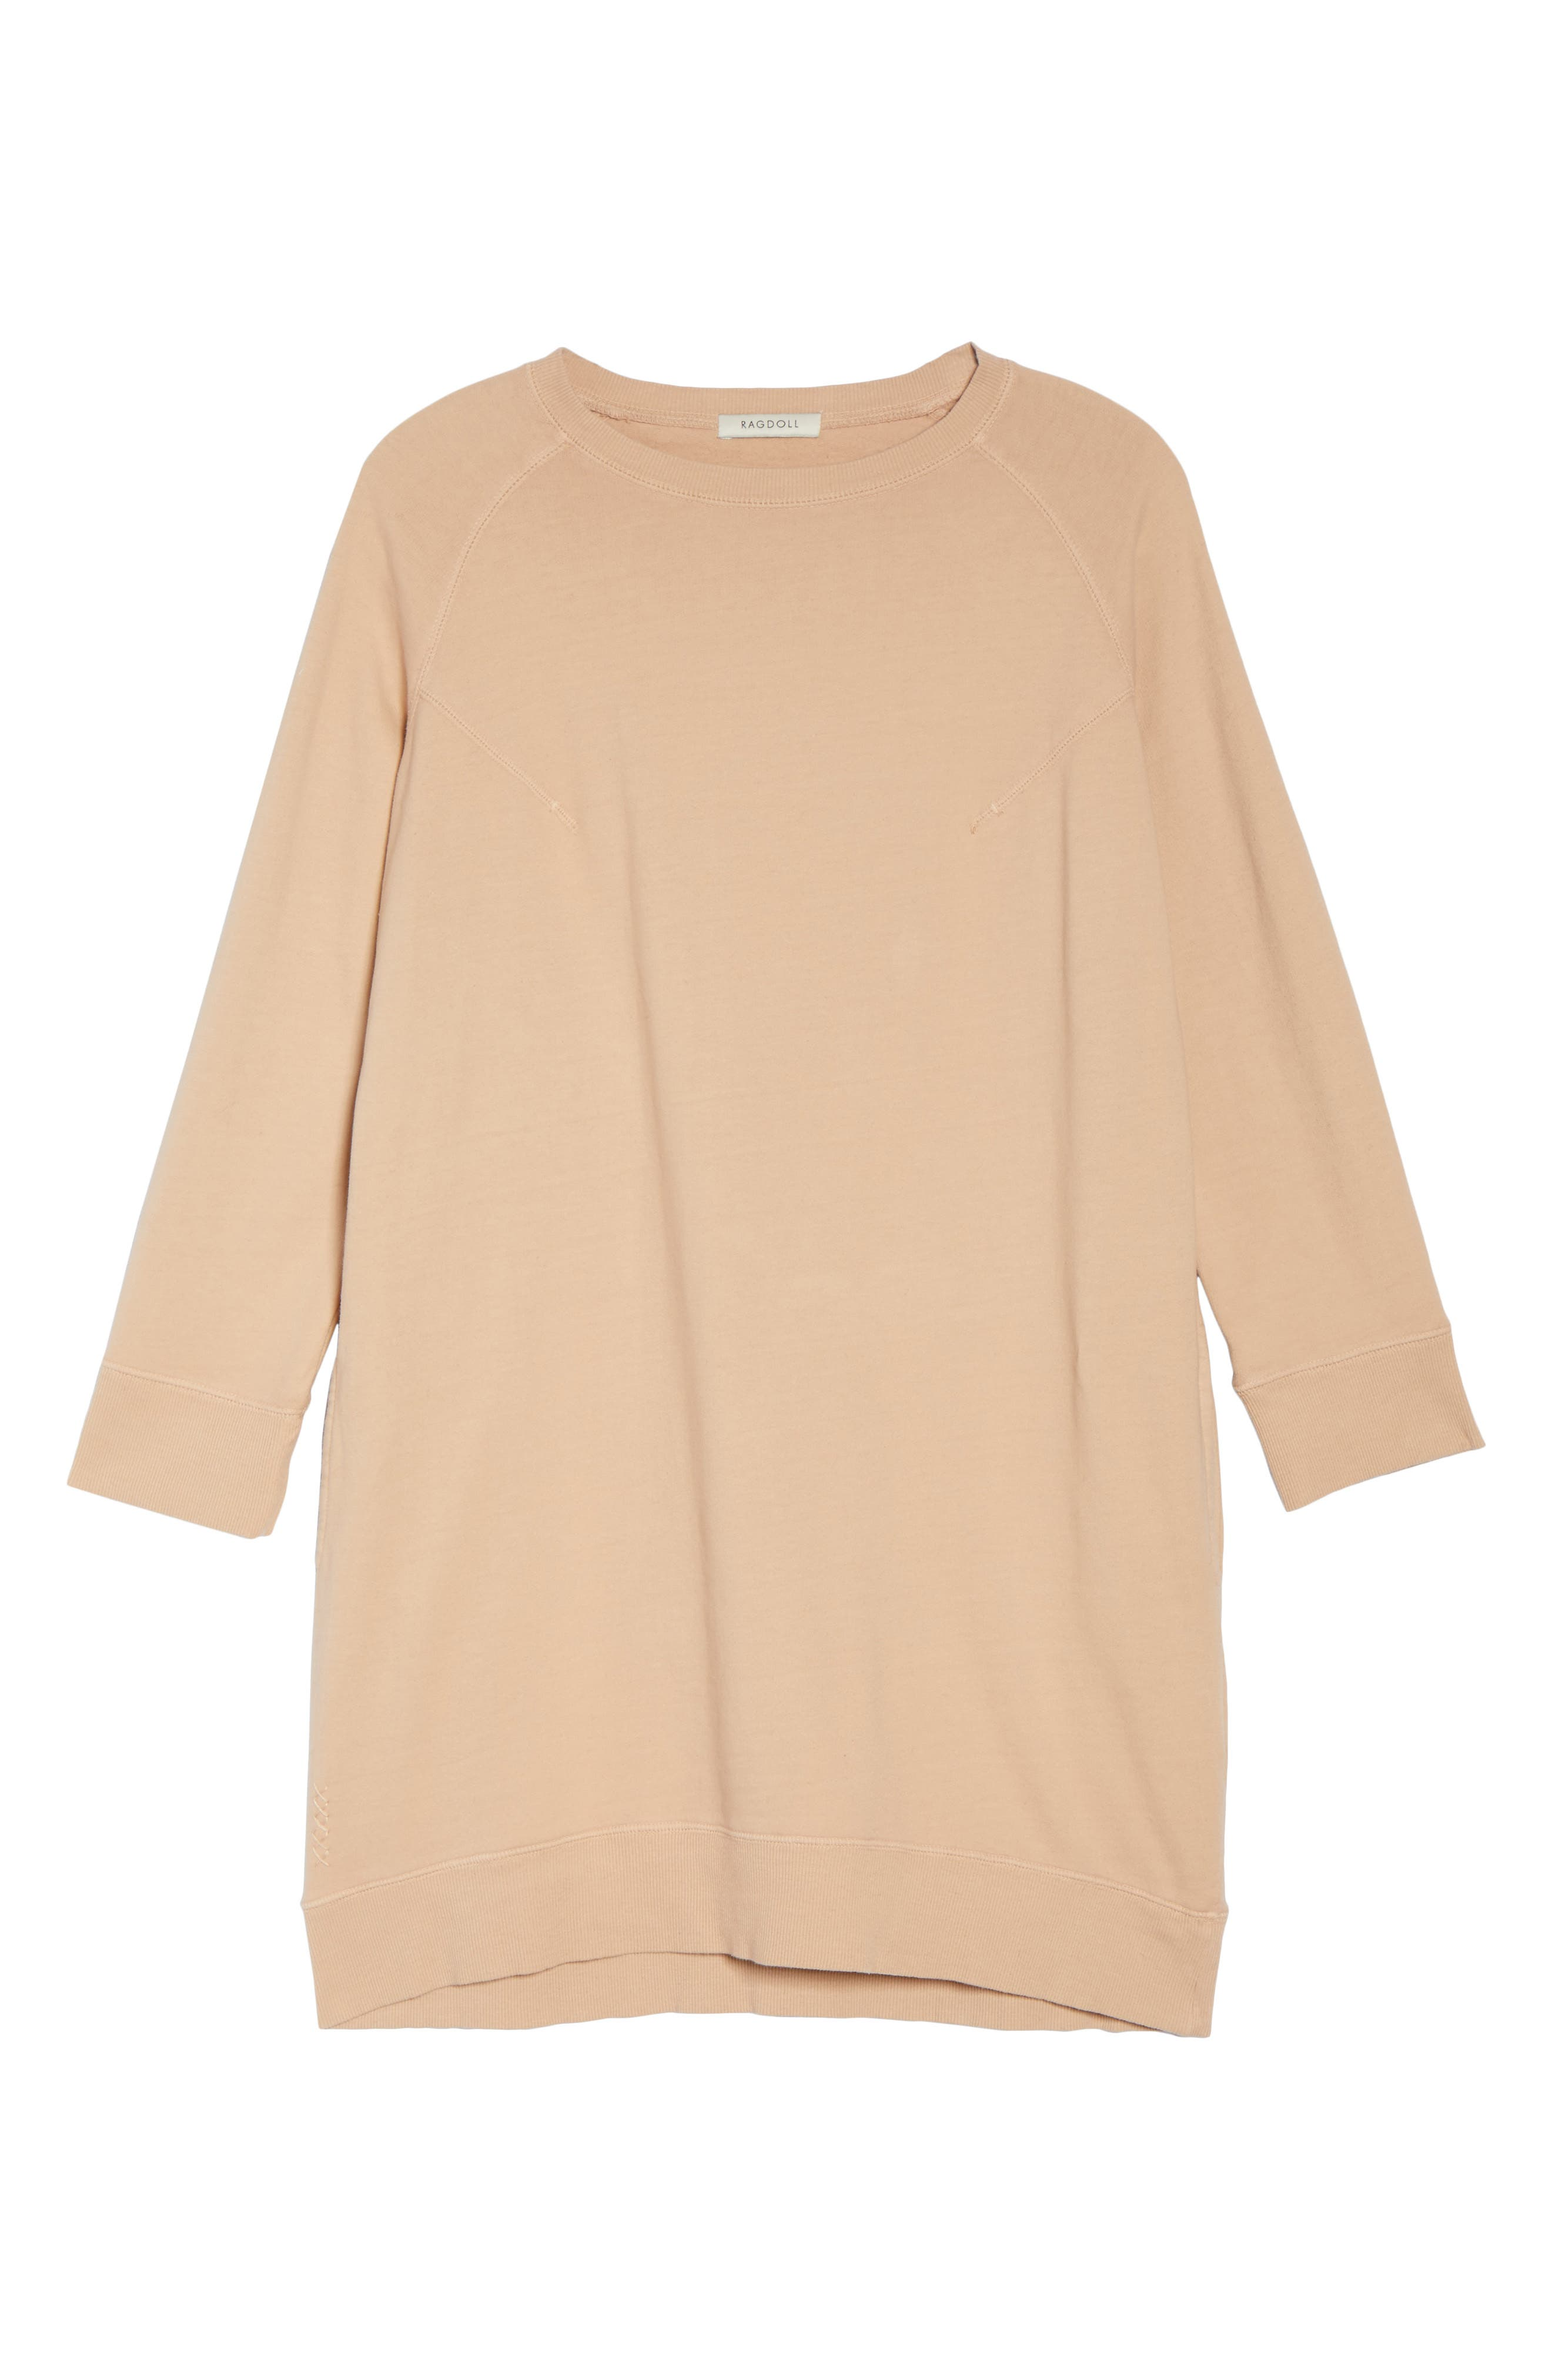 Sweatshirt Dress,                             Alternate thumbnail 6, color,                             950